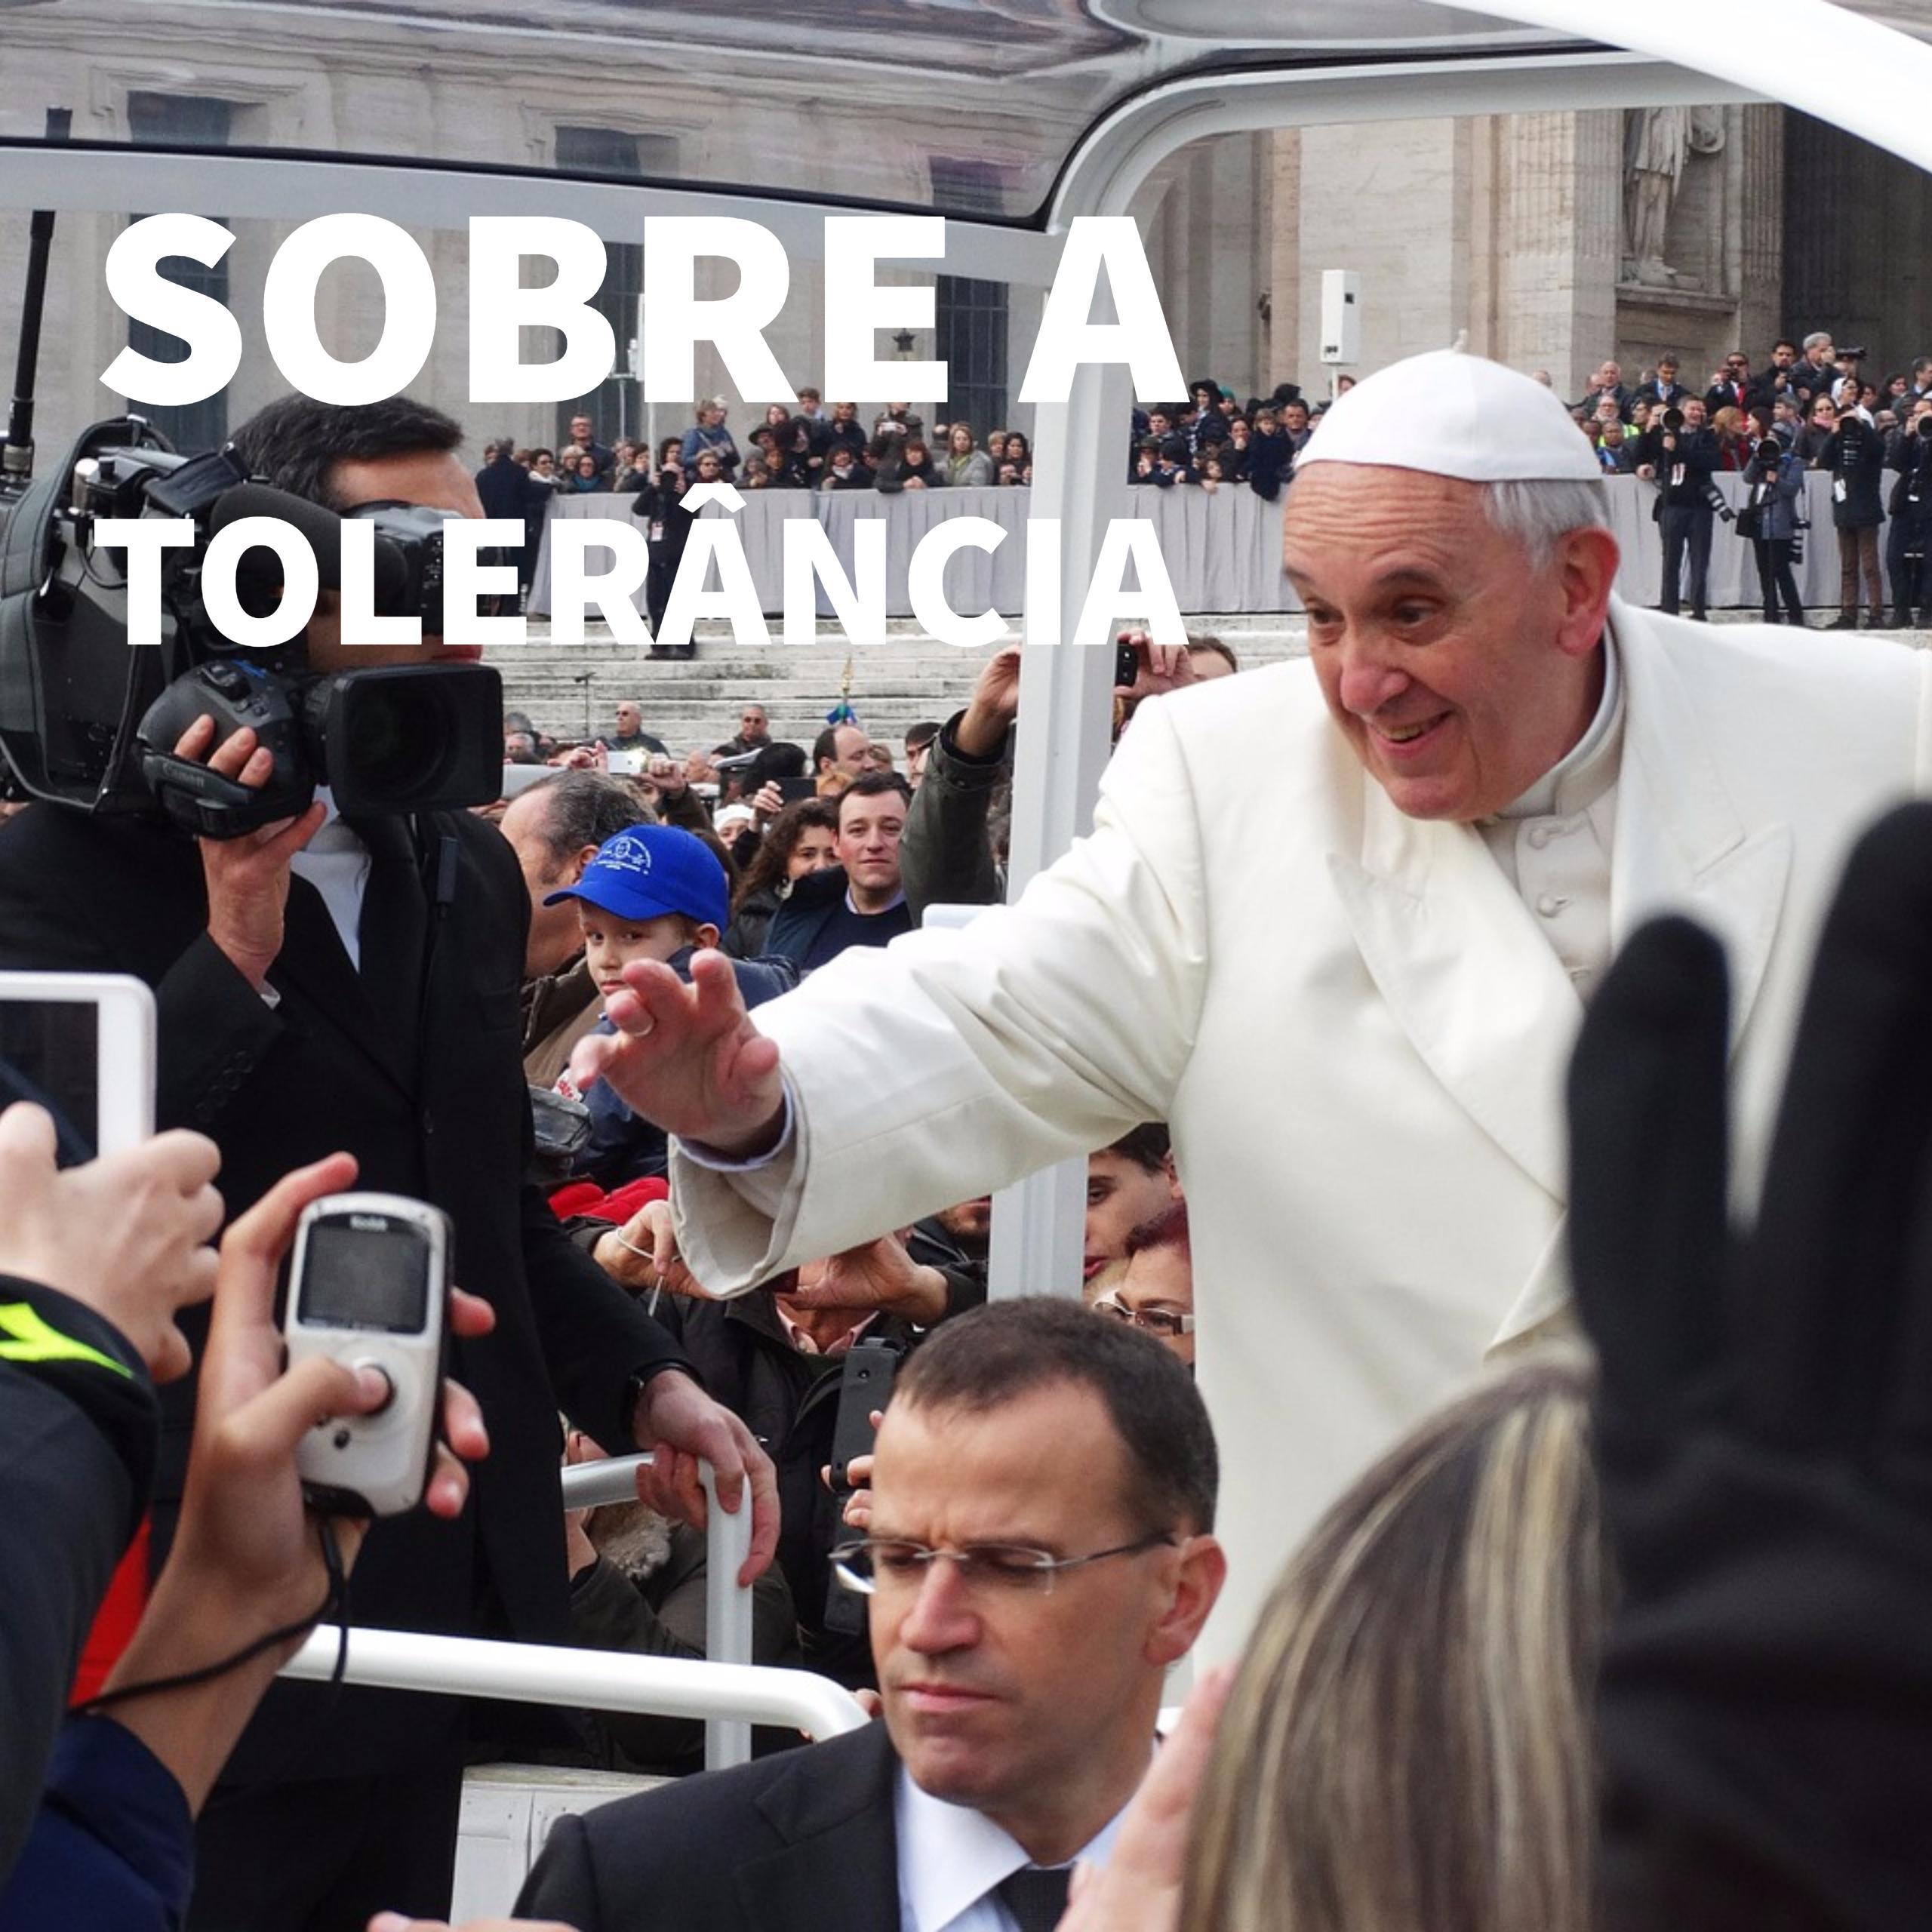 Sobre a Tolerância